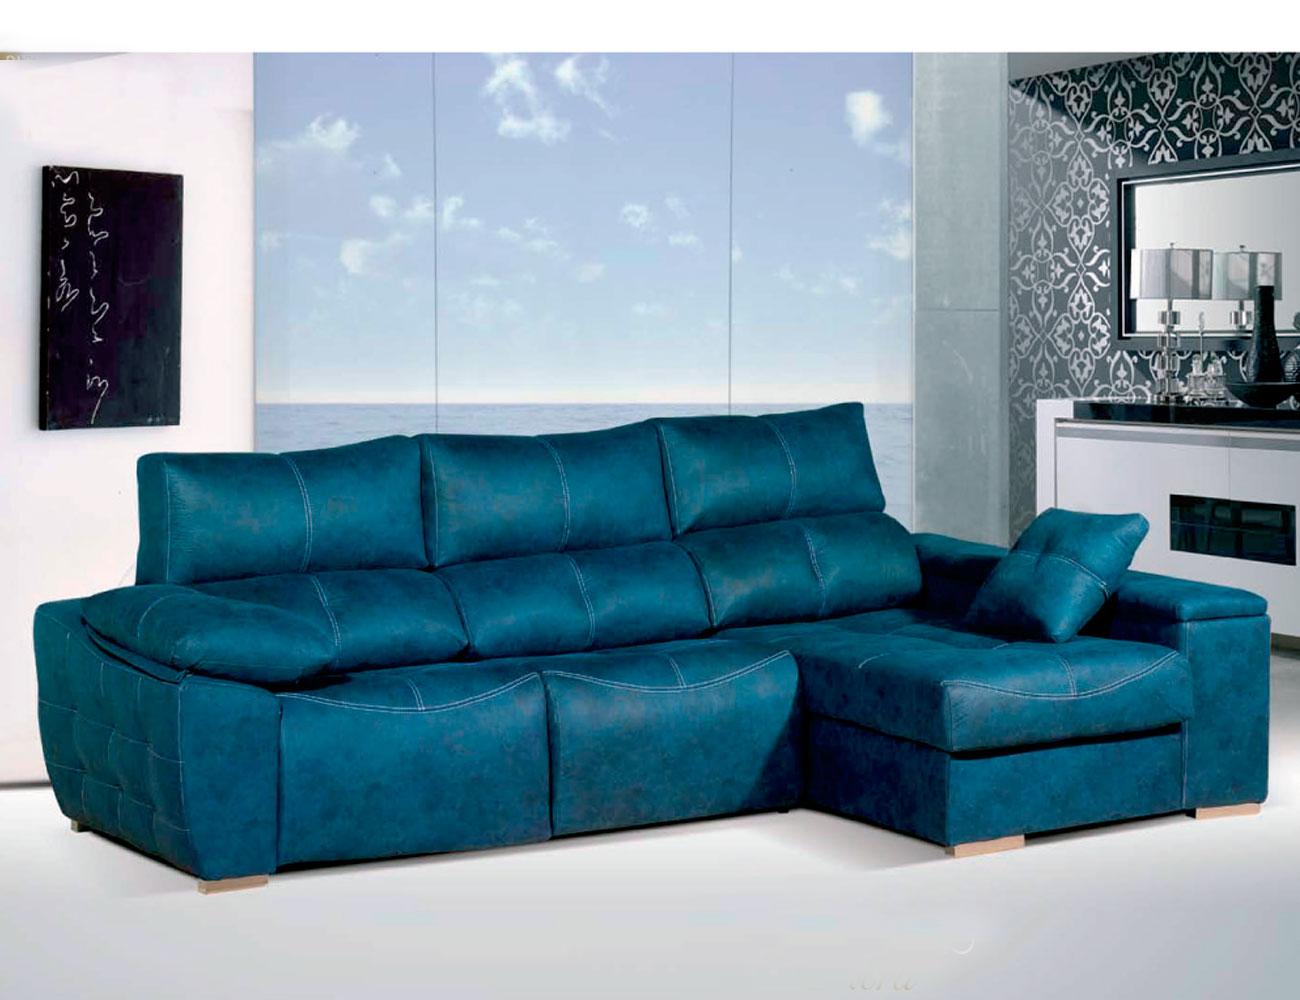 Sofa chaiselongue relax 2 motores anti manchas turquesa8